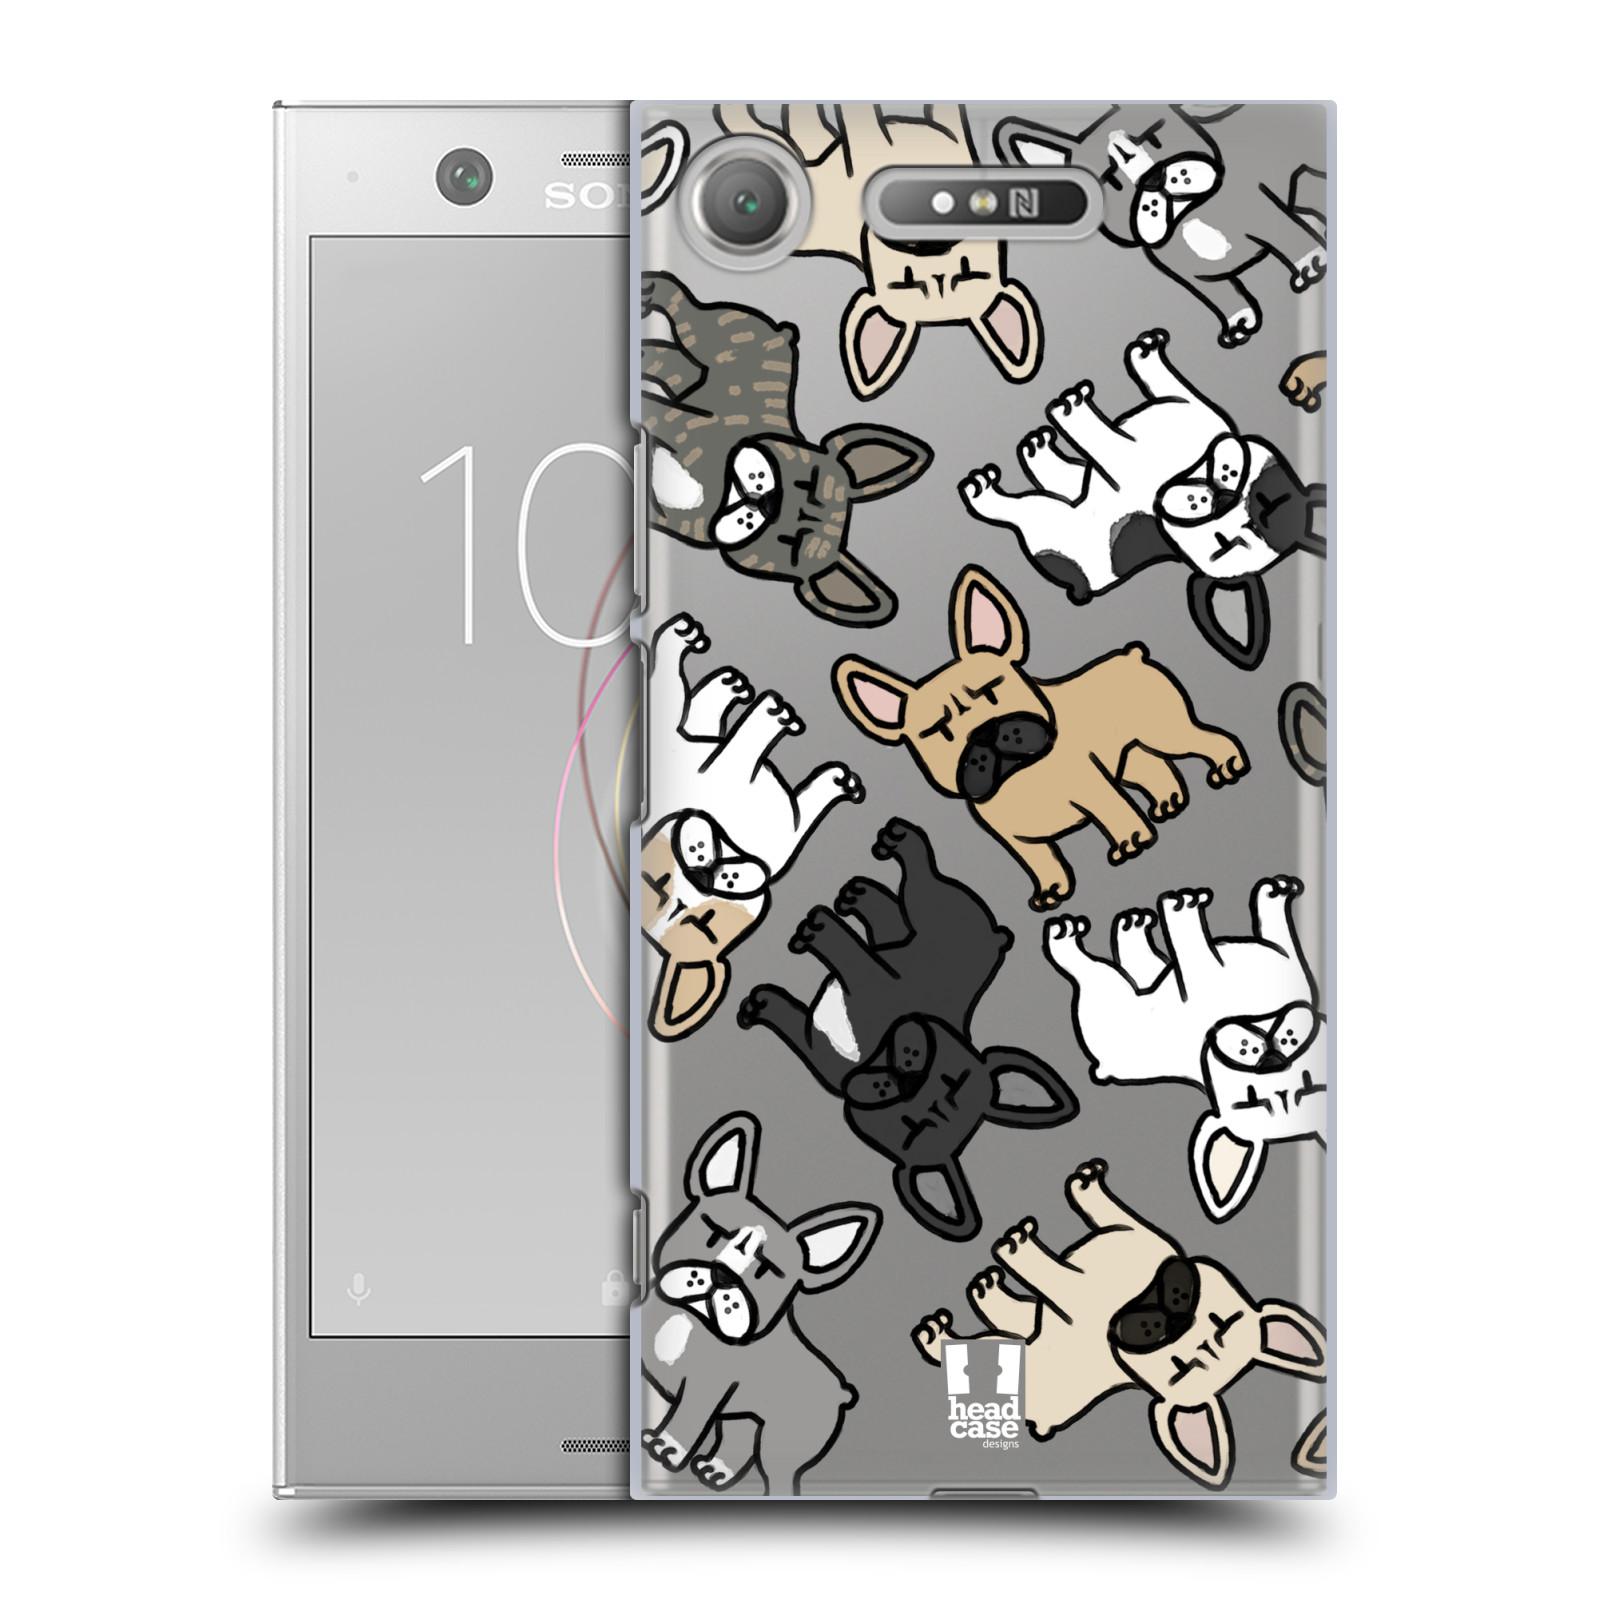 HEAD CASE plastový obal na mobil Sony Xperia XZ1 pejsek francouzský buldog